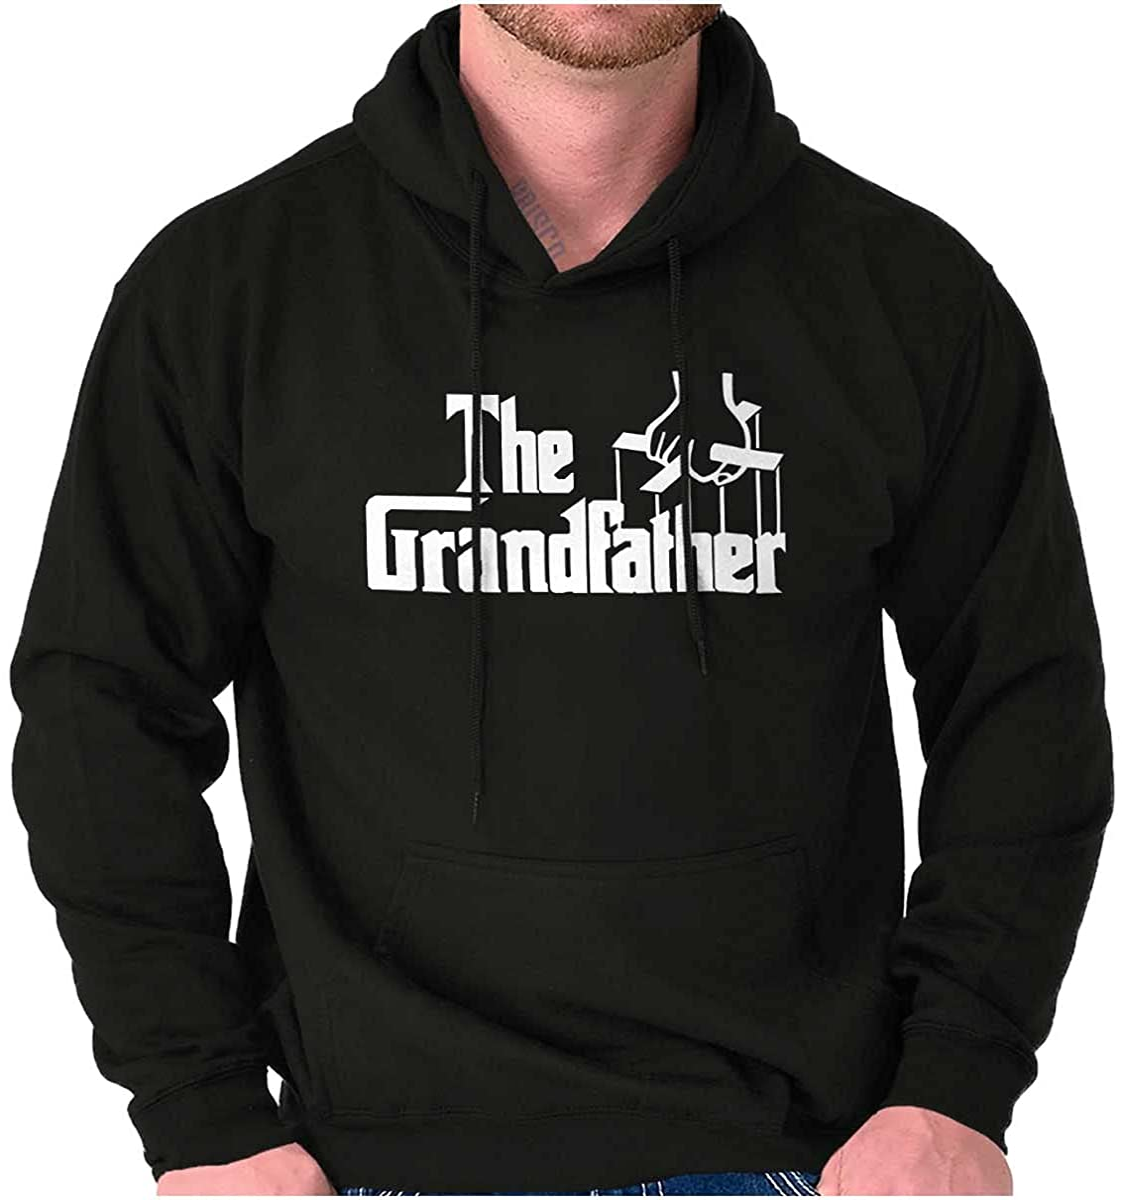 Grandfather Italian Mafia Puppet Hoodie Hooded Sweatshirt Men